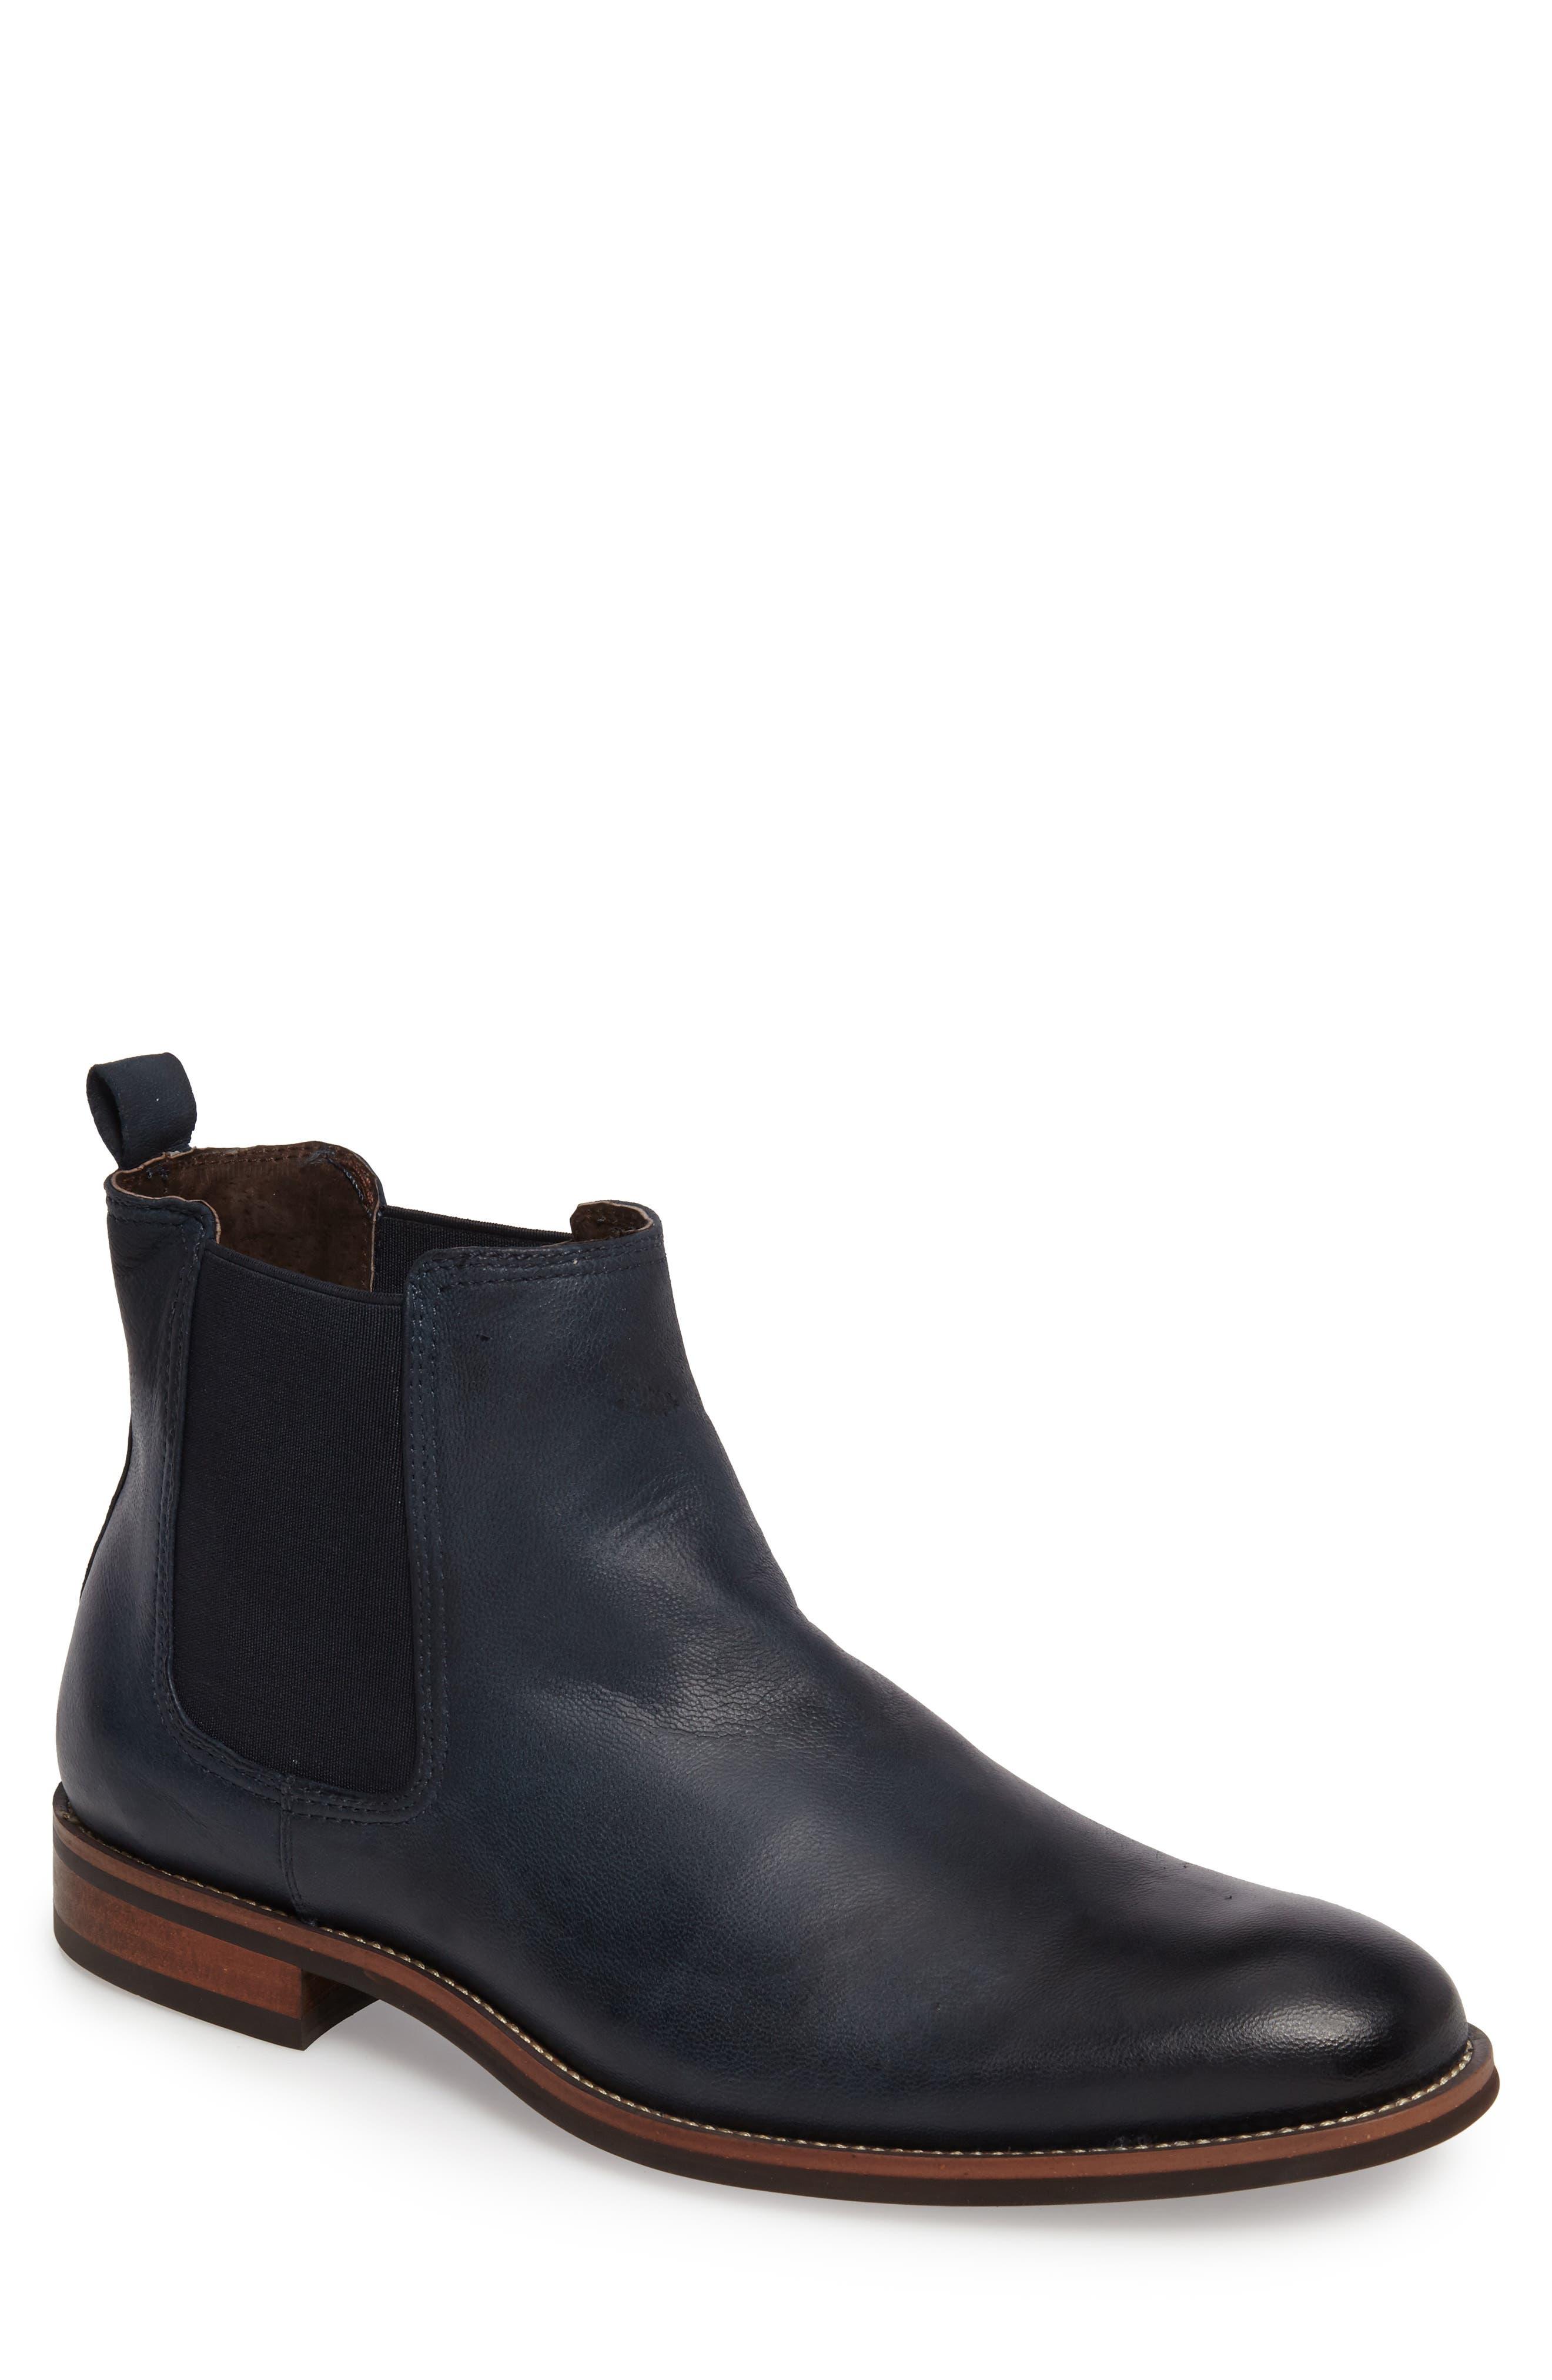 Alternate Image 1 Selected - Jump Lawson Chelsea Boot (Men)